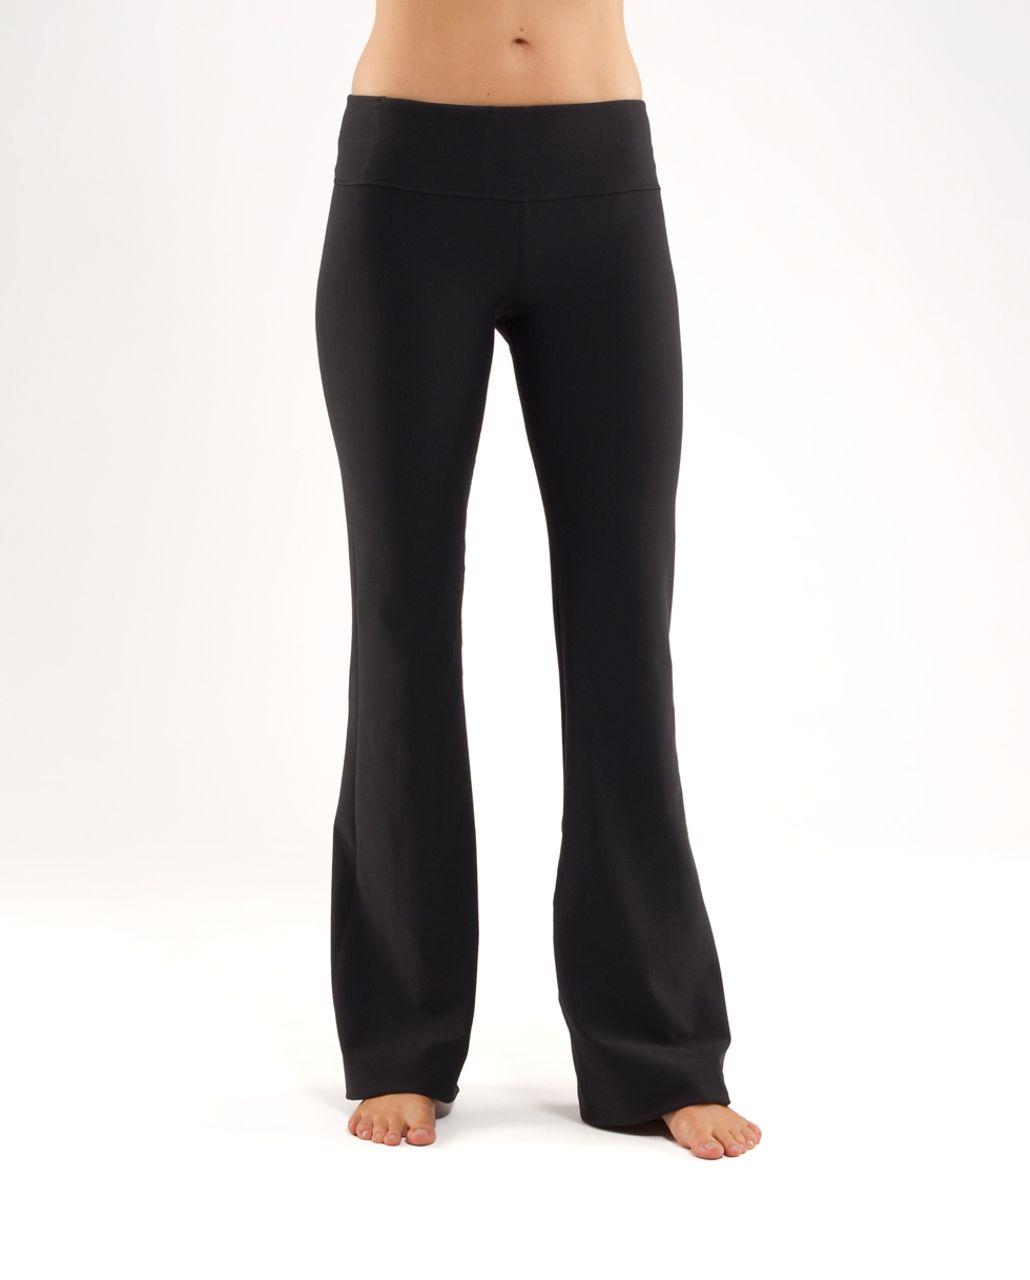 Lululemon Groove Pant (Tall) - Black /  Black Nesting Black Bird Print